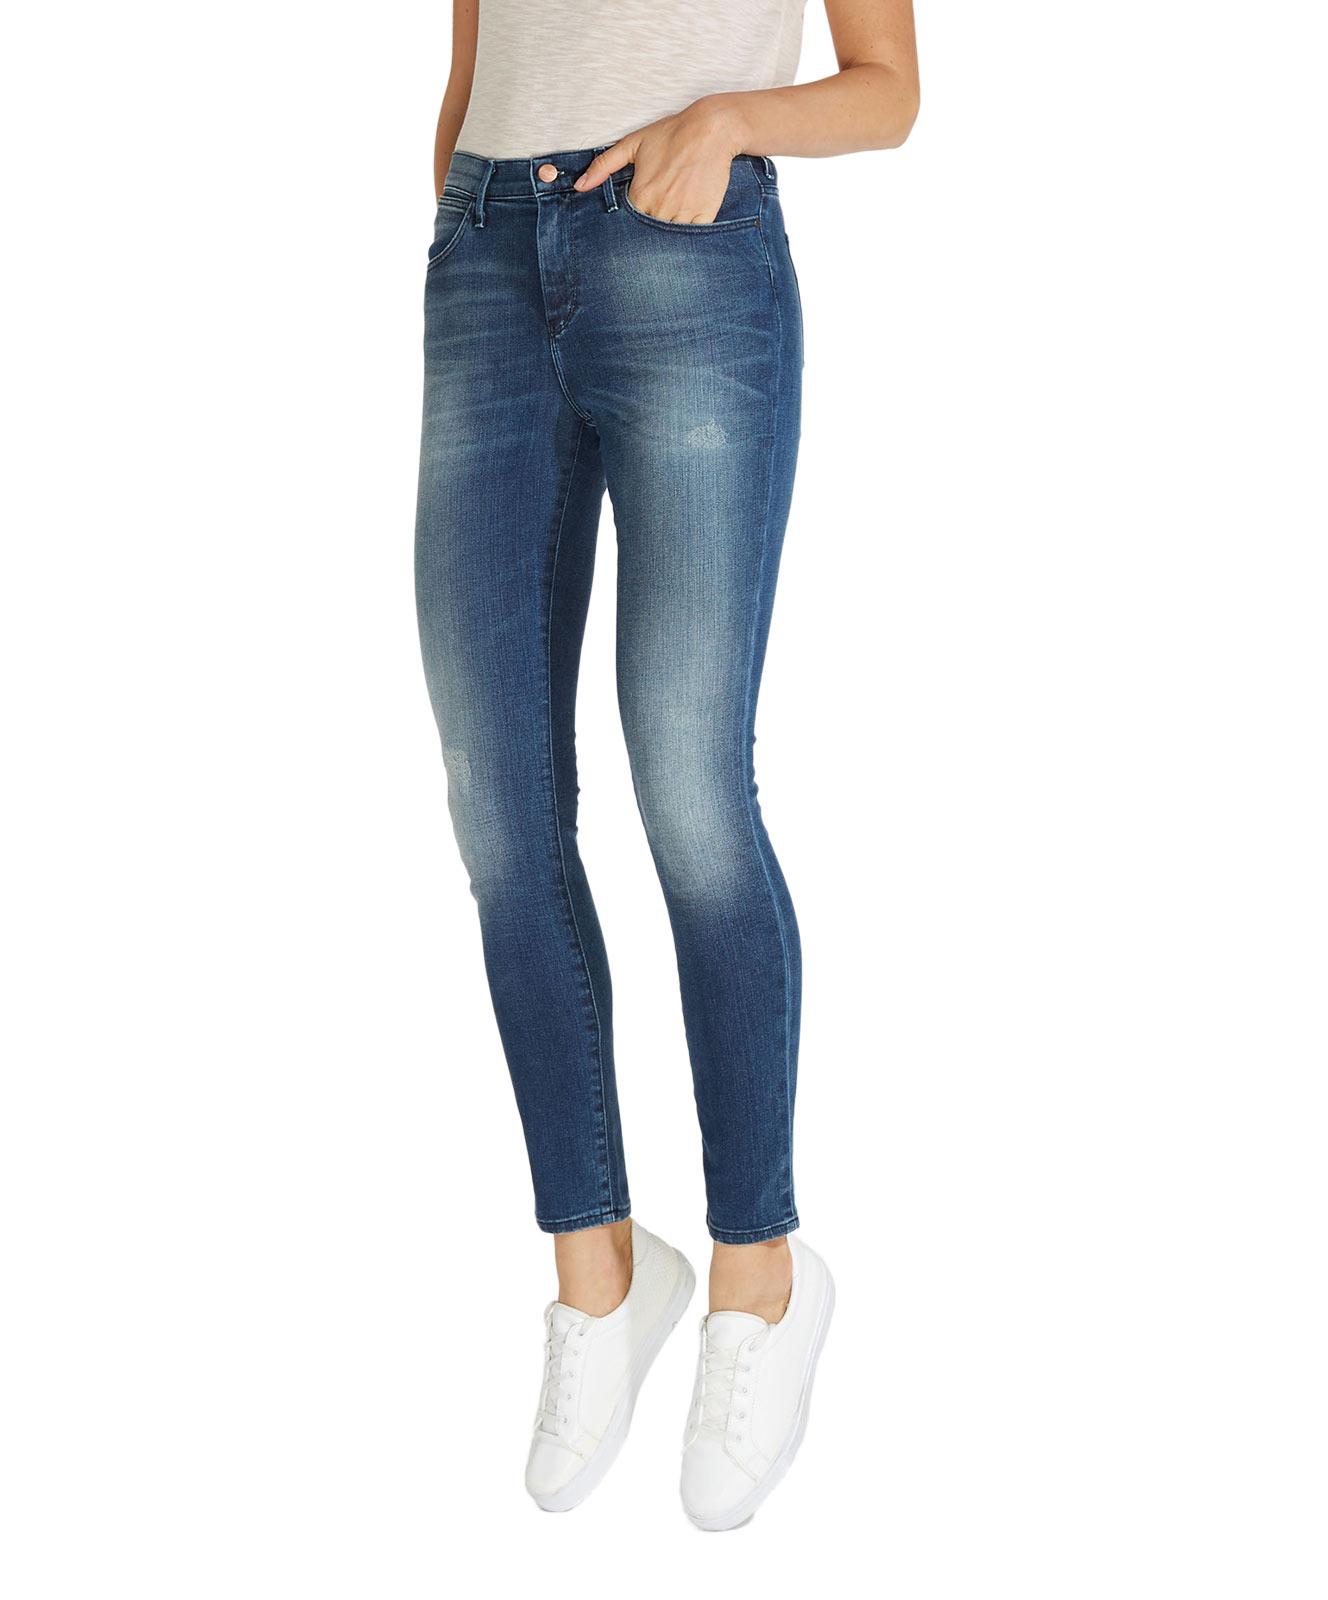 Hosen für Frauen - WRANGLER HIGH RISE SKINNY Jeans Vintage Blue  - Onlineshop Jeans Meile